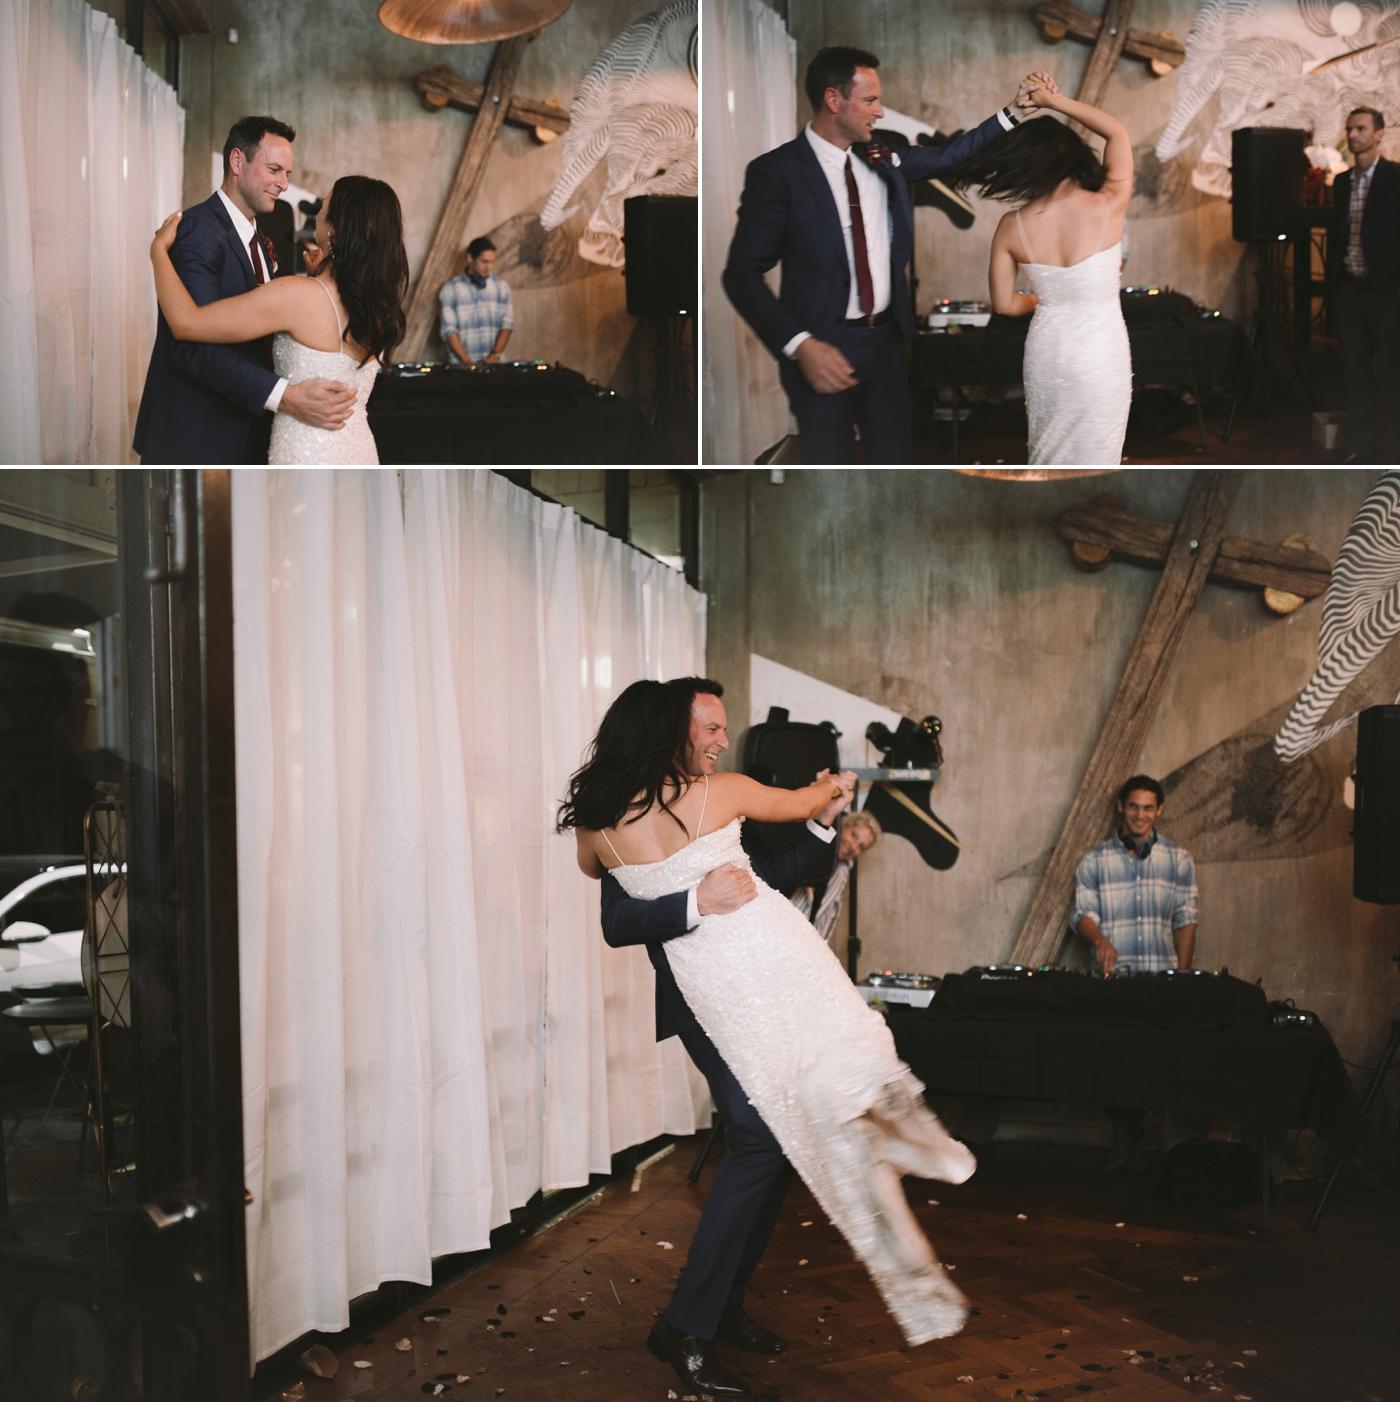 Kellie & Brent - Adelaide City Wedding - Natural wedding photography in Adelaide - Katherine Schultz - www.katherineschultzphotography.com